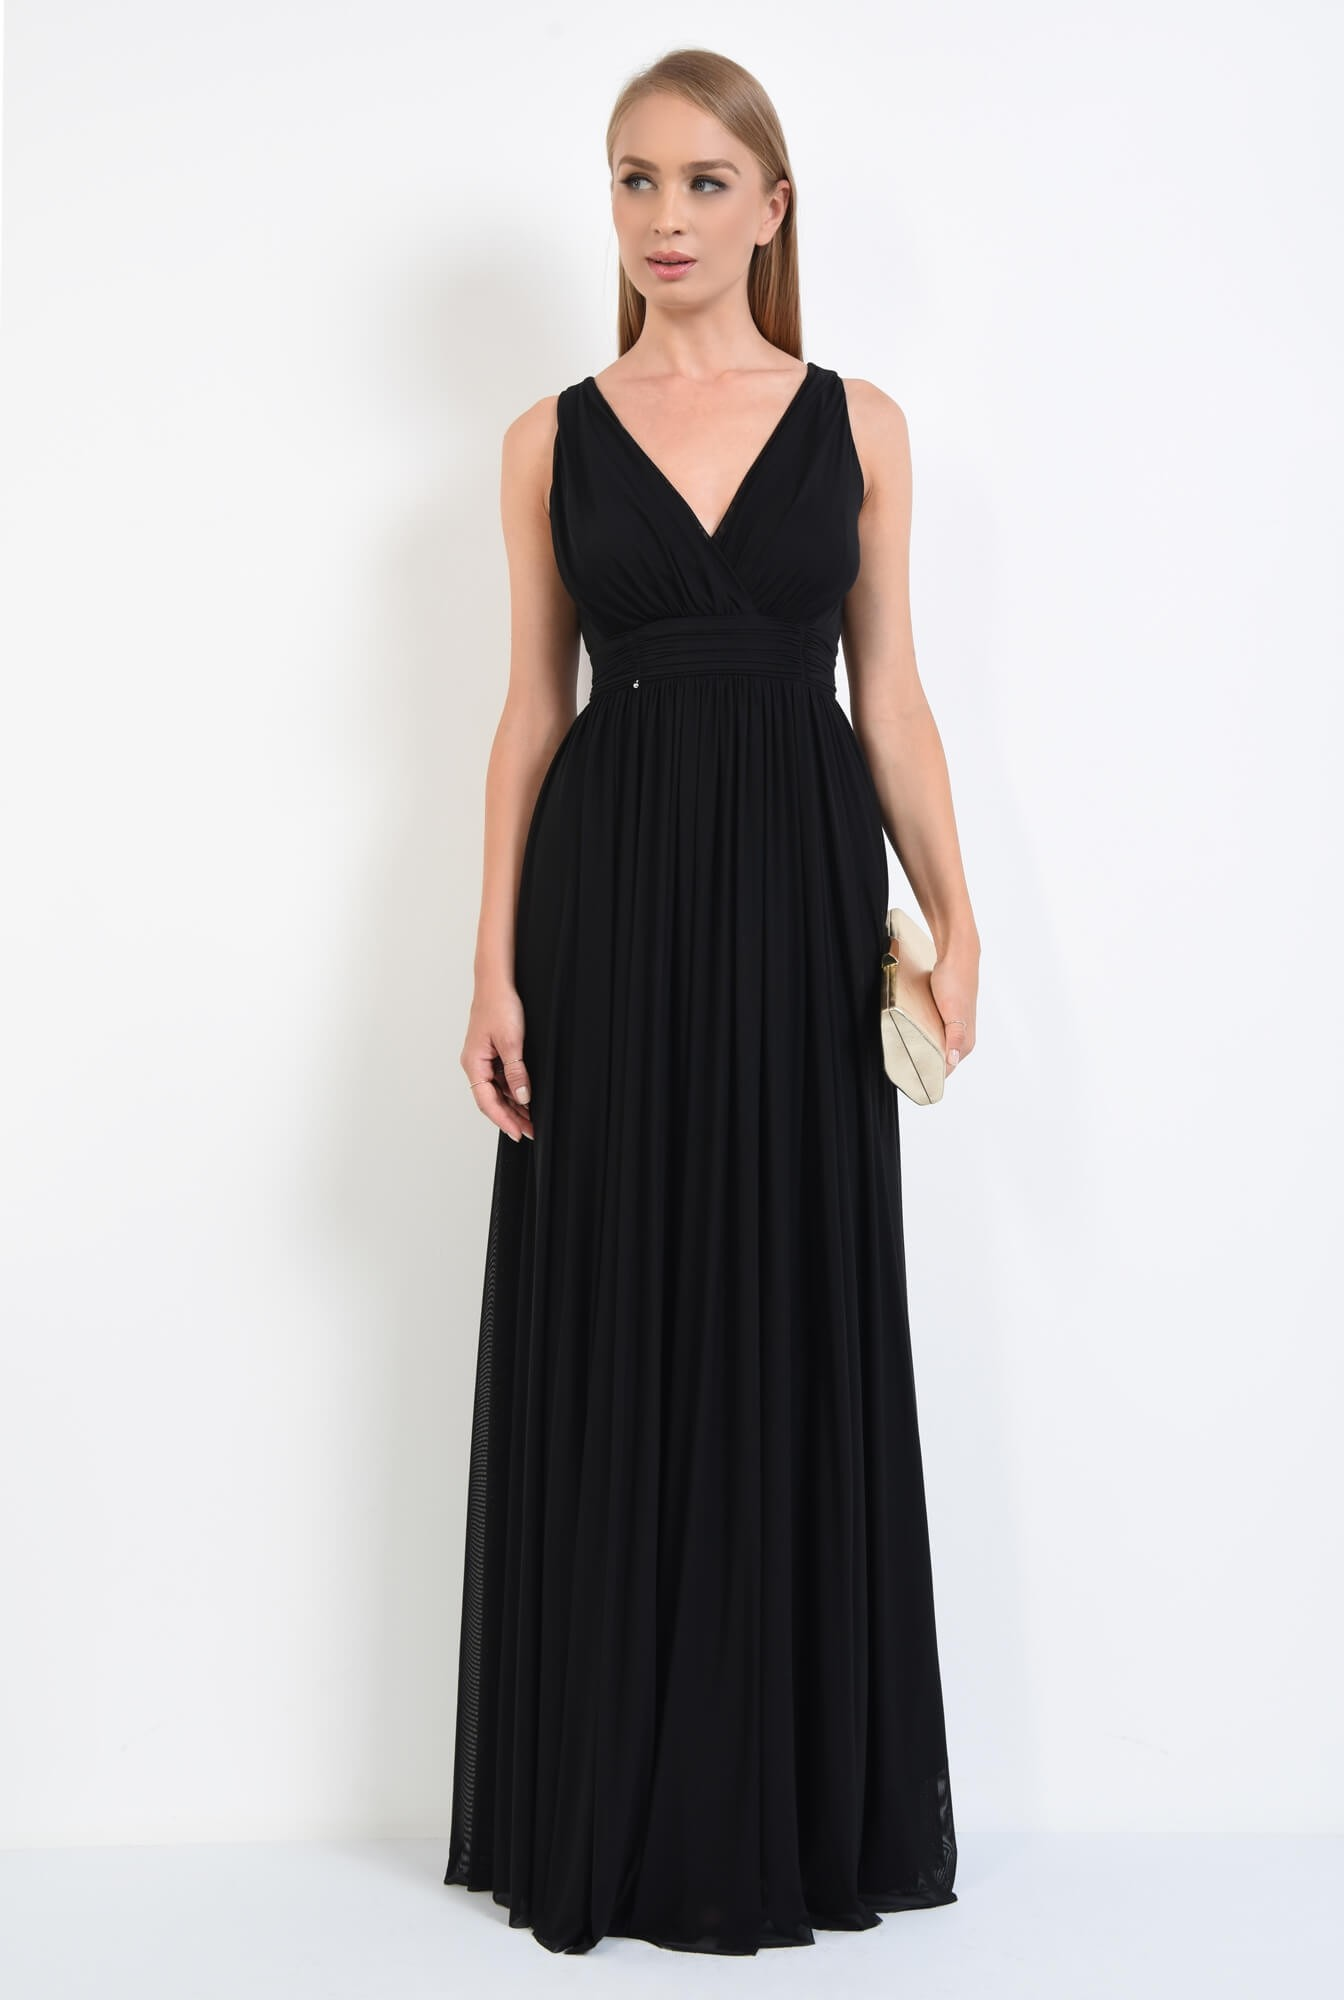 3 - rochie eleganta, lunga, tul, negru, decolteu, anchior